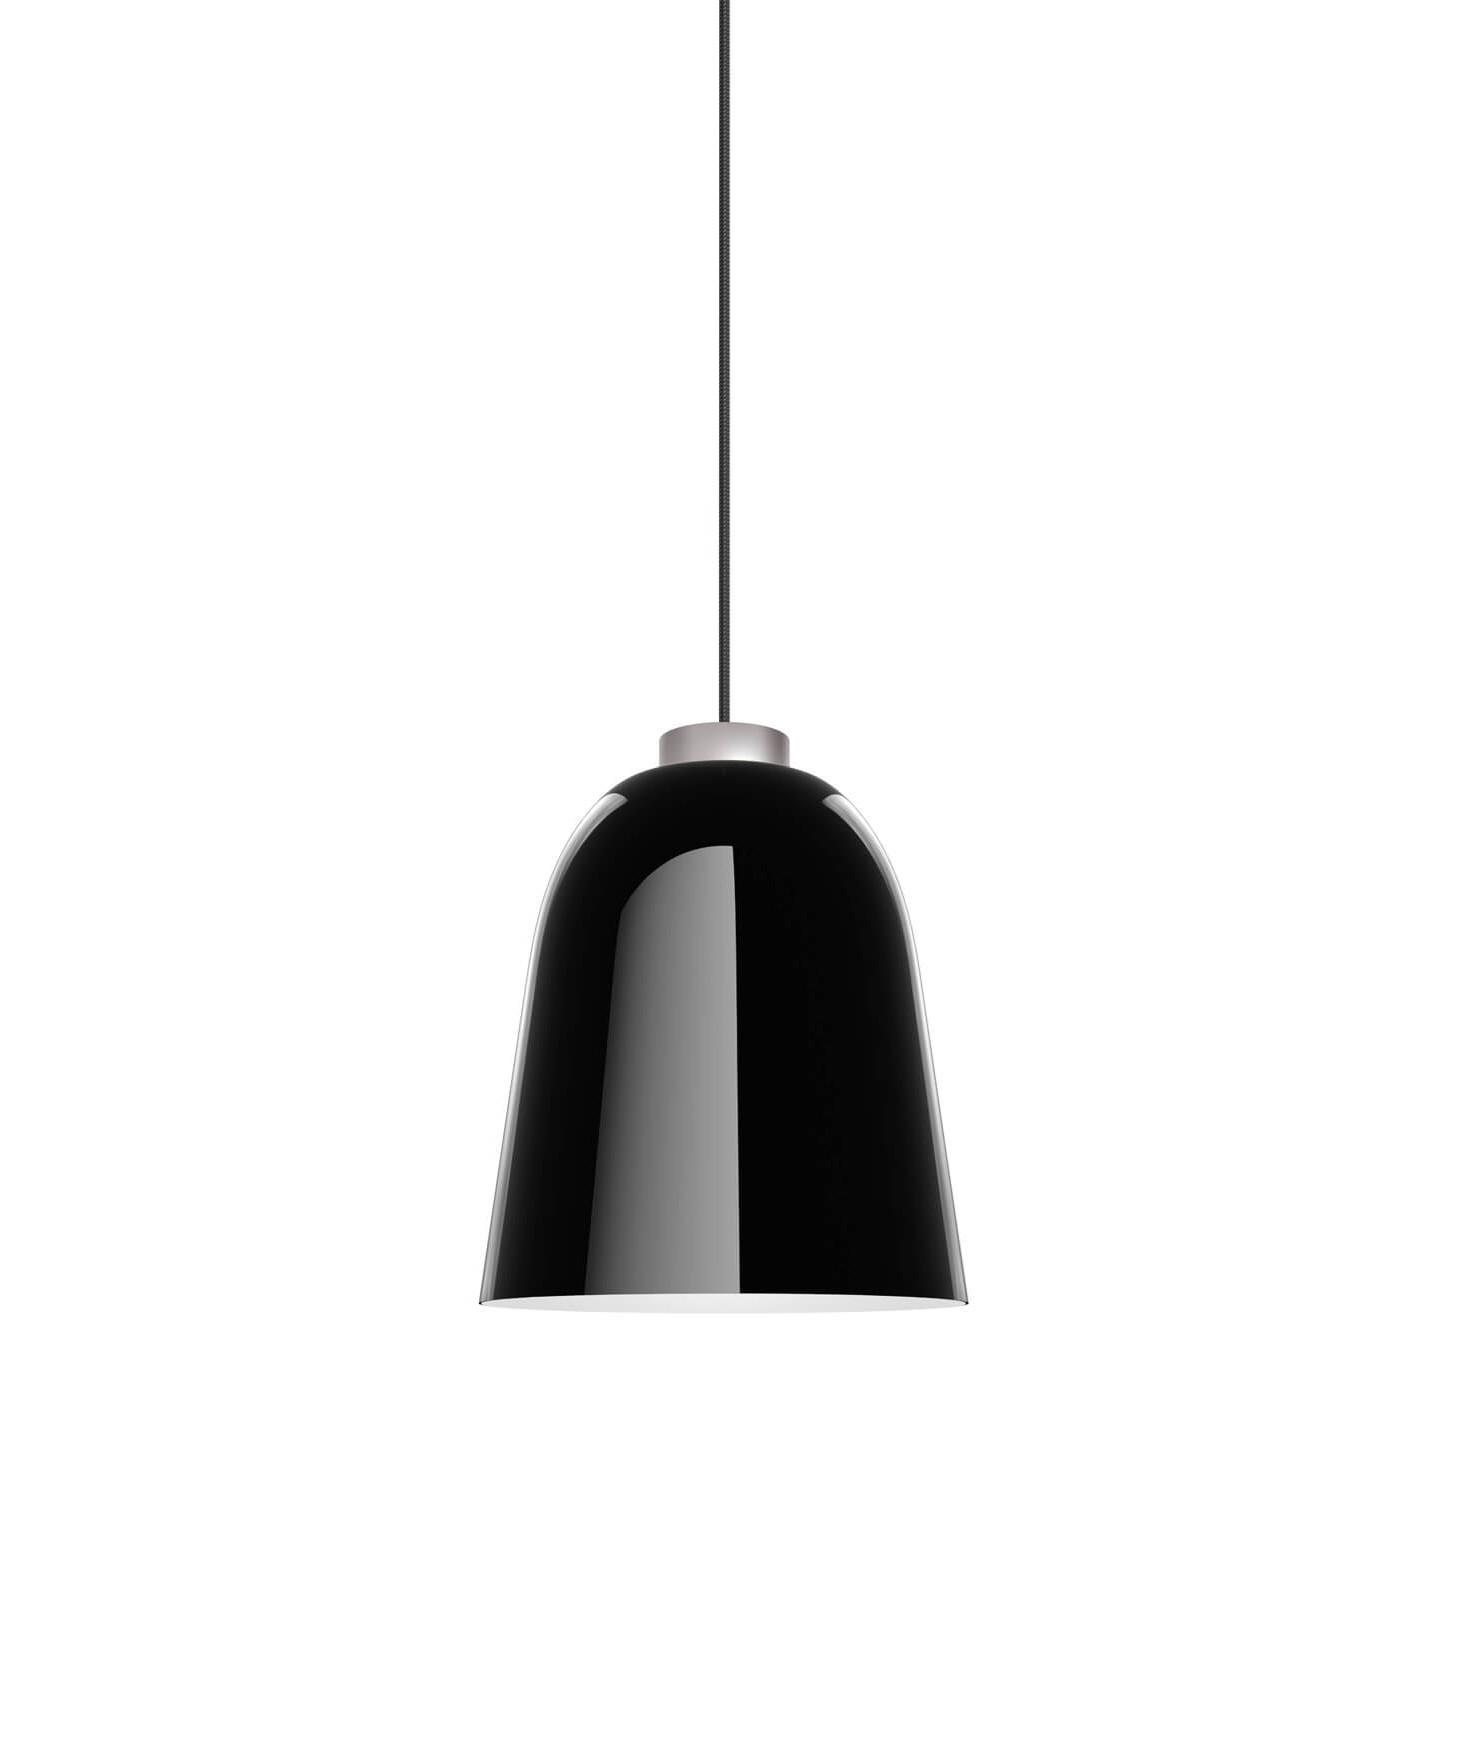 summera pendelleuchte medium gl nzend schwarz silber shapes. Black Bedroom Furniture Sets. Home Design Ideas